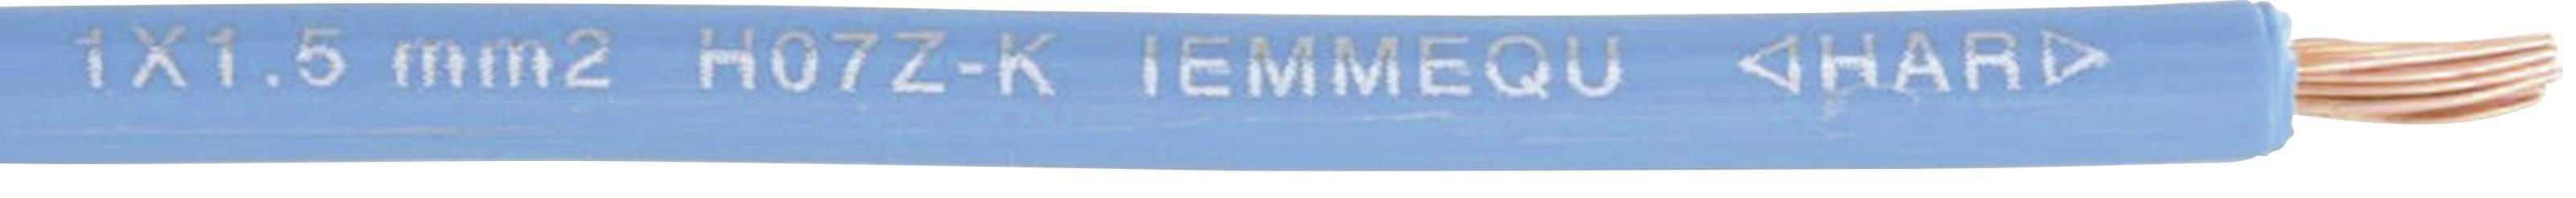 Opletenie / lanko Faber Kabel 040290 H05Z-K, 1 x 0.50 mm², vonkajší Ø 1.90 mm, 100 m, svetlomodrá